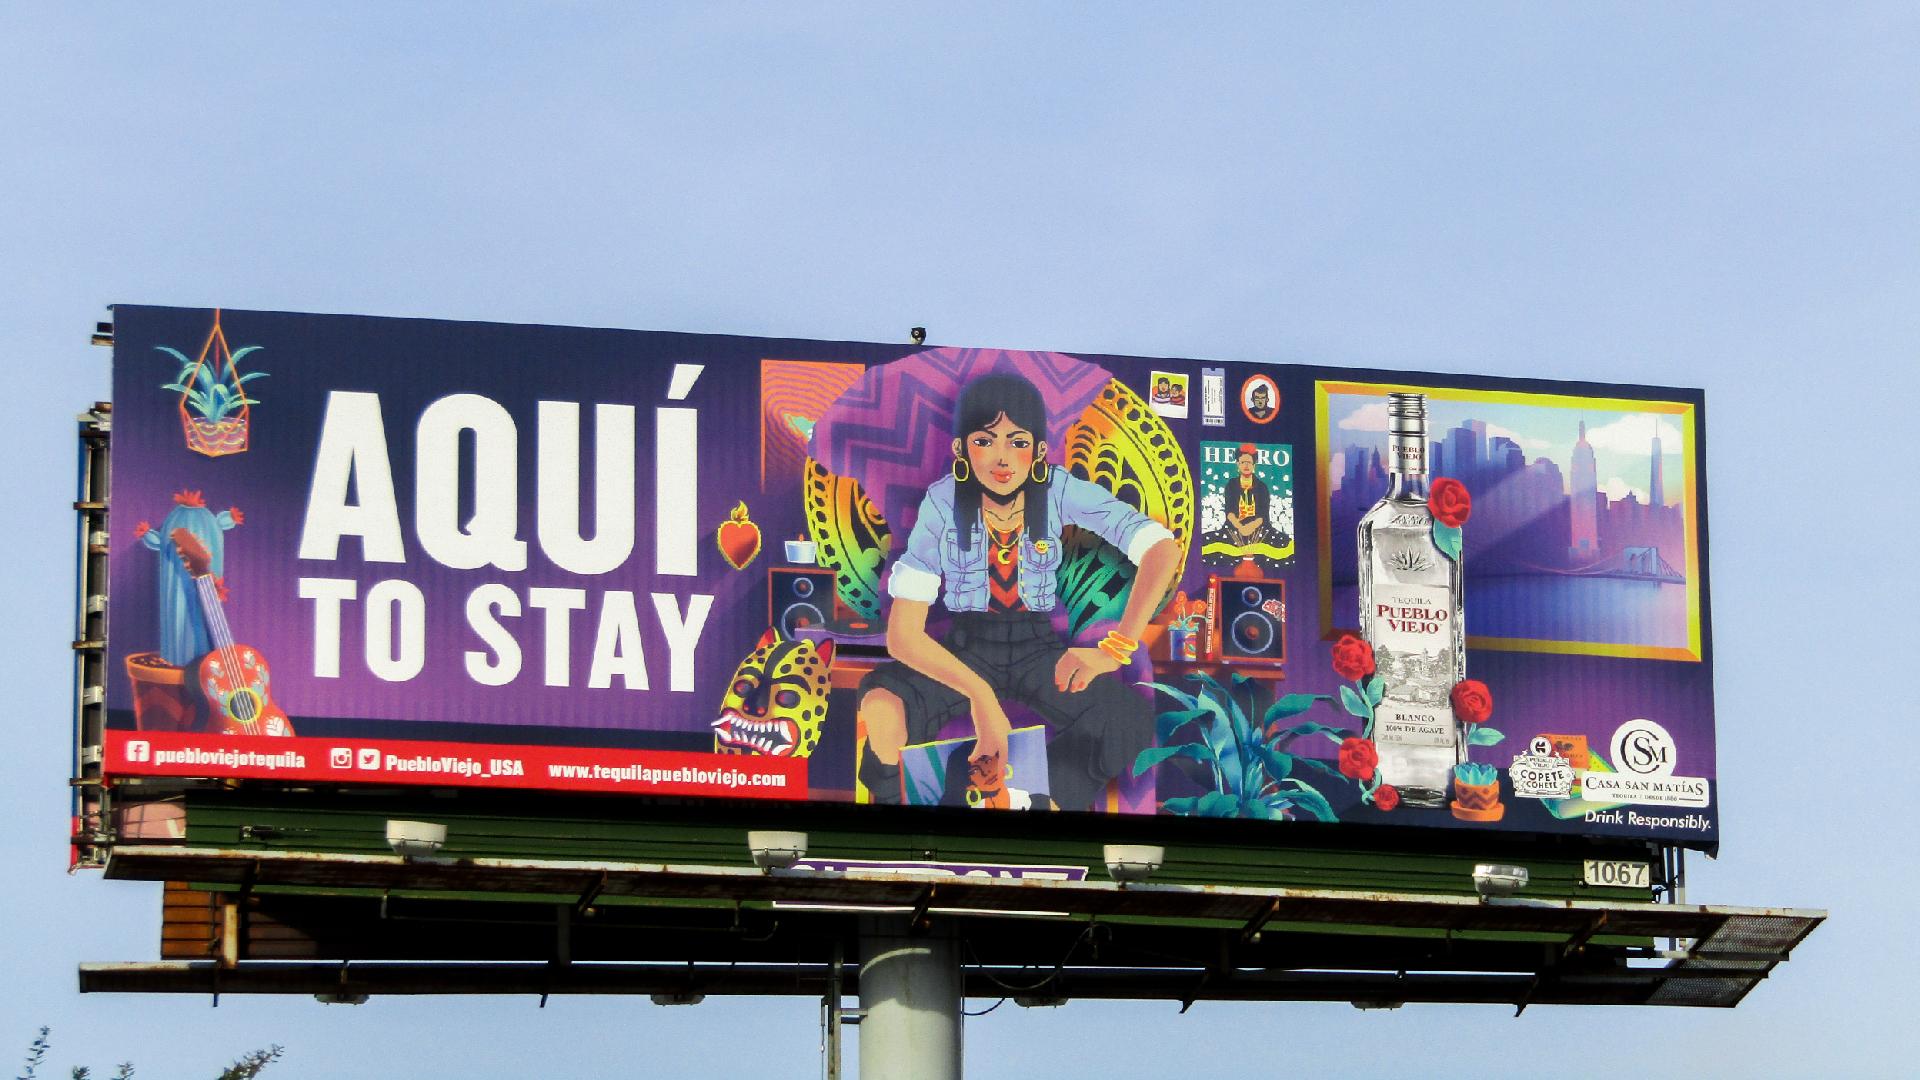 Hand painted art billboard